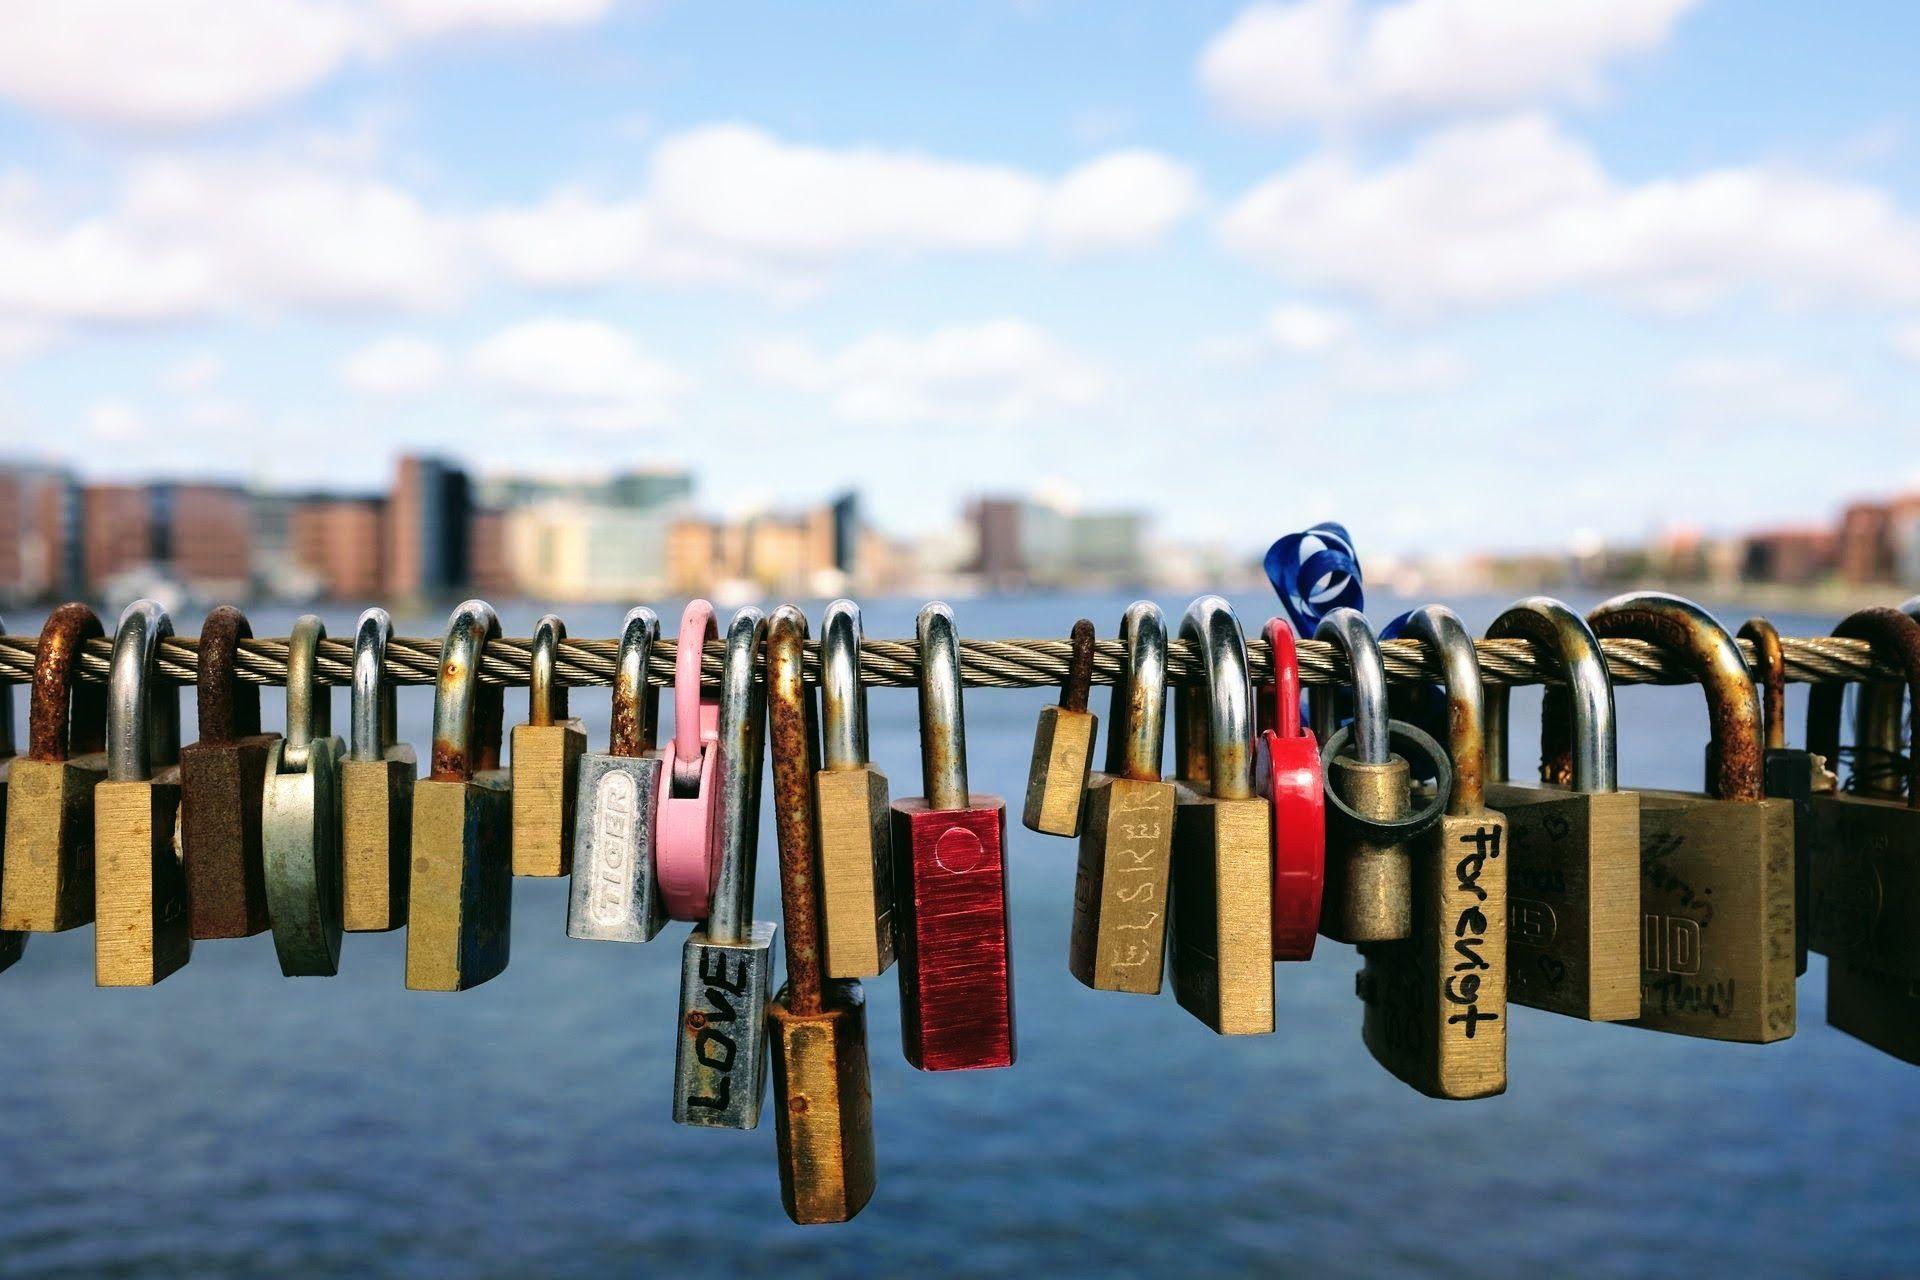 Copenhagen (Denmark) - photography - travel Ⓒ PASTELPIX